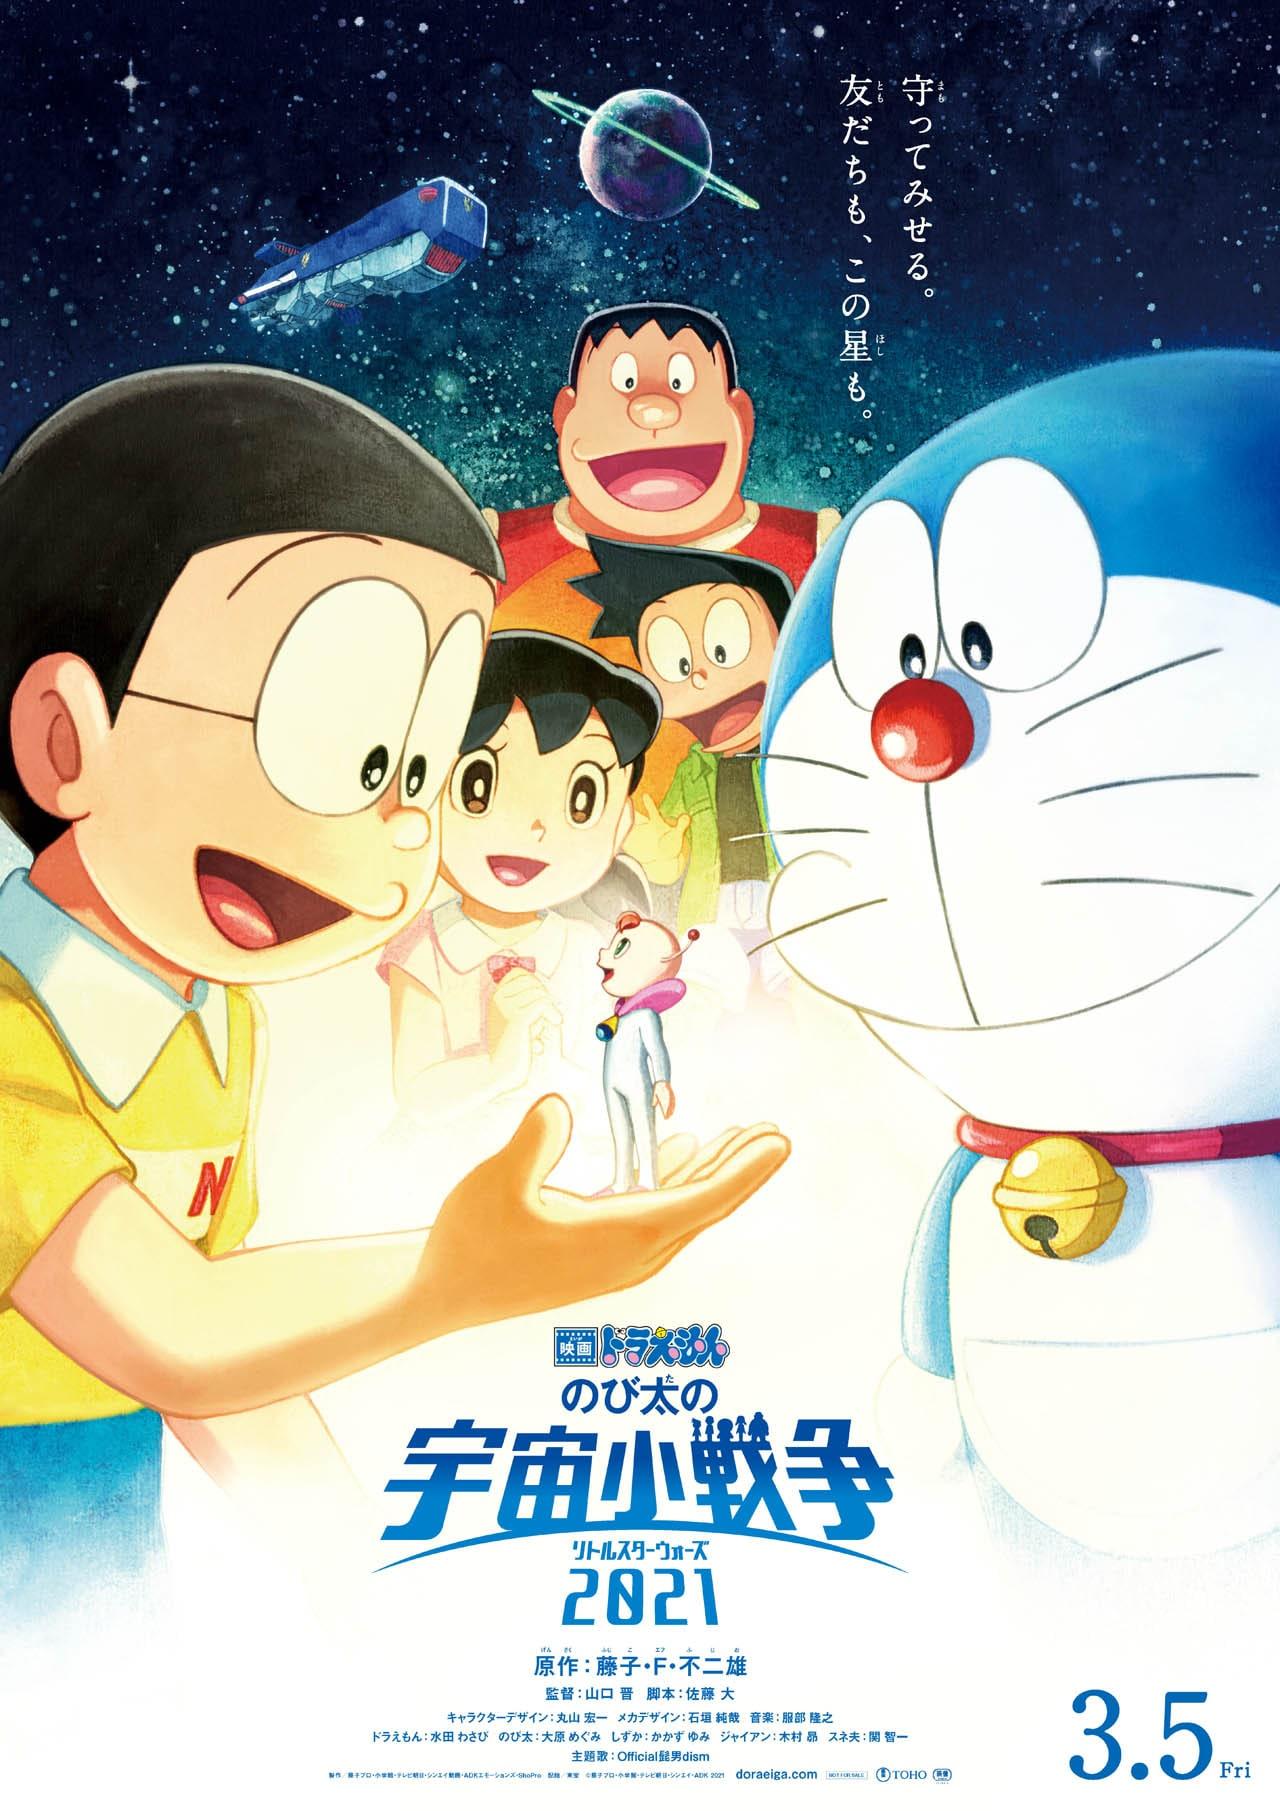 2021 Doraemon Film Reveals Title, Trailer, March 2021 Opening